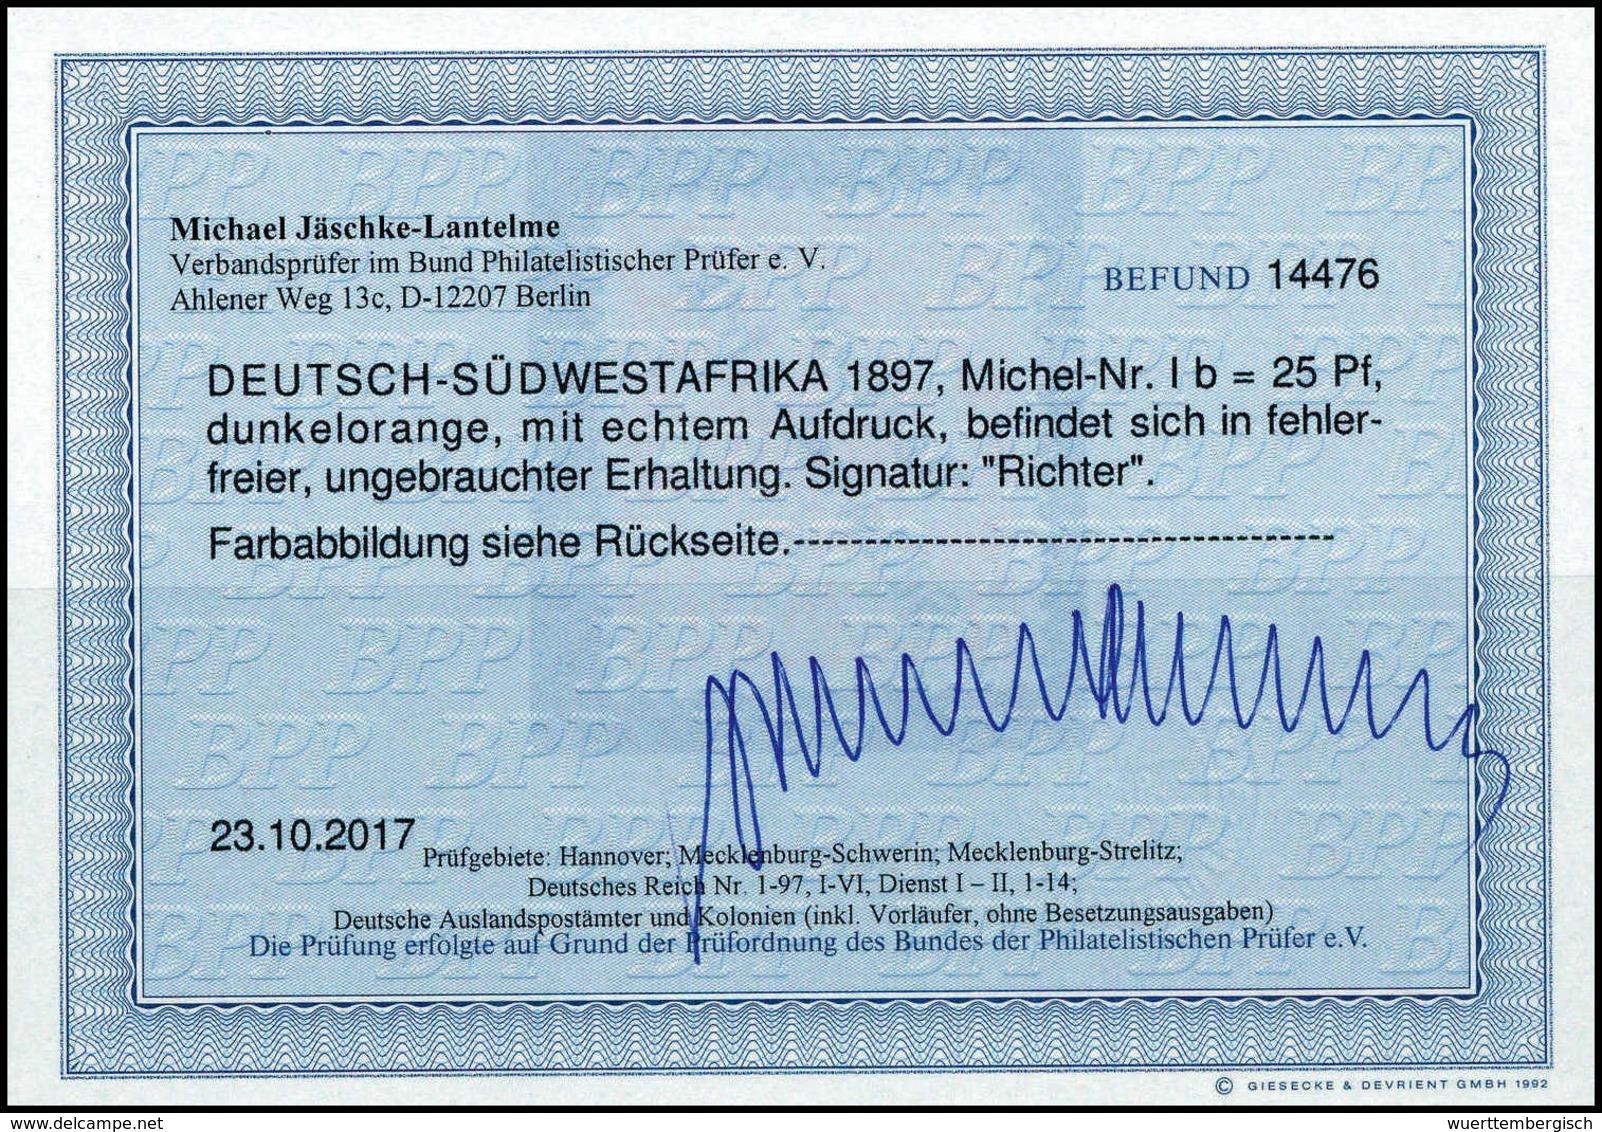 * 25 Pfg., Tadellos Ungebr., Fotobefund Jäschke-L.BPP.<br/><b>Katalogpreis: 350,-</b> (Michel: Ib) - Unclassified